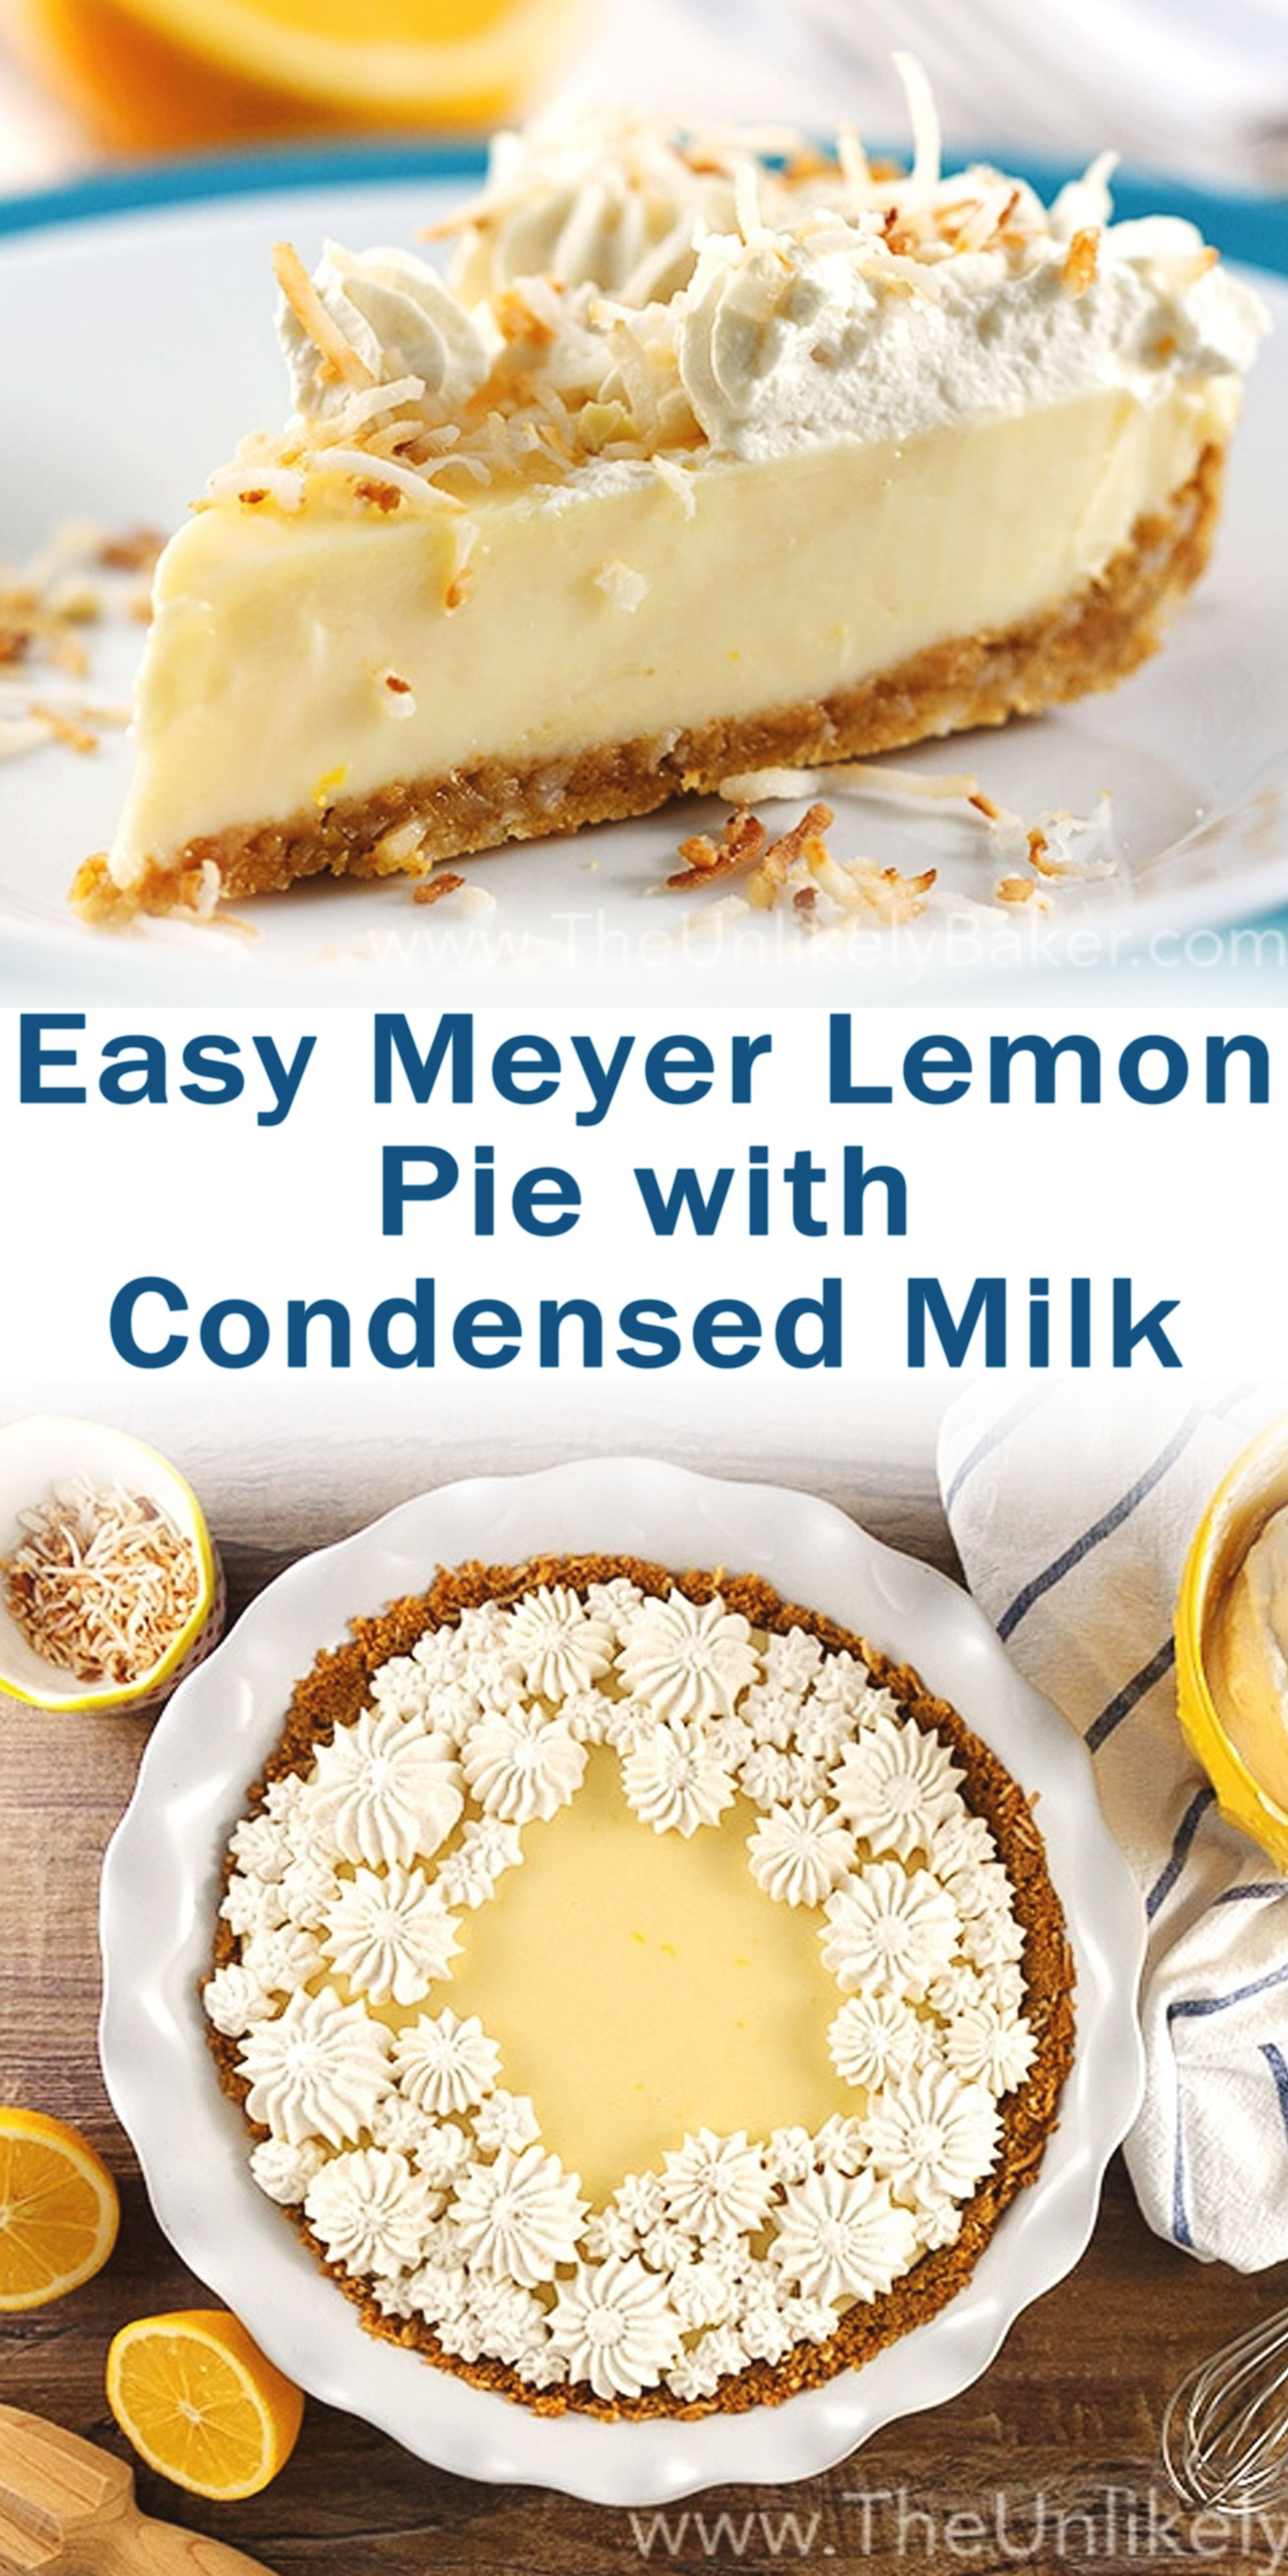 Easy Meyer Lemon Pie With Condensed Milk In 2020 Lemon Desserts Lemon Pie Desserts